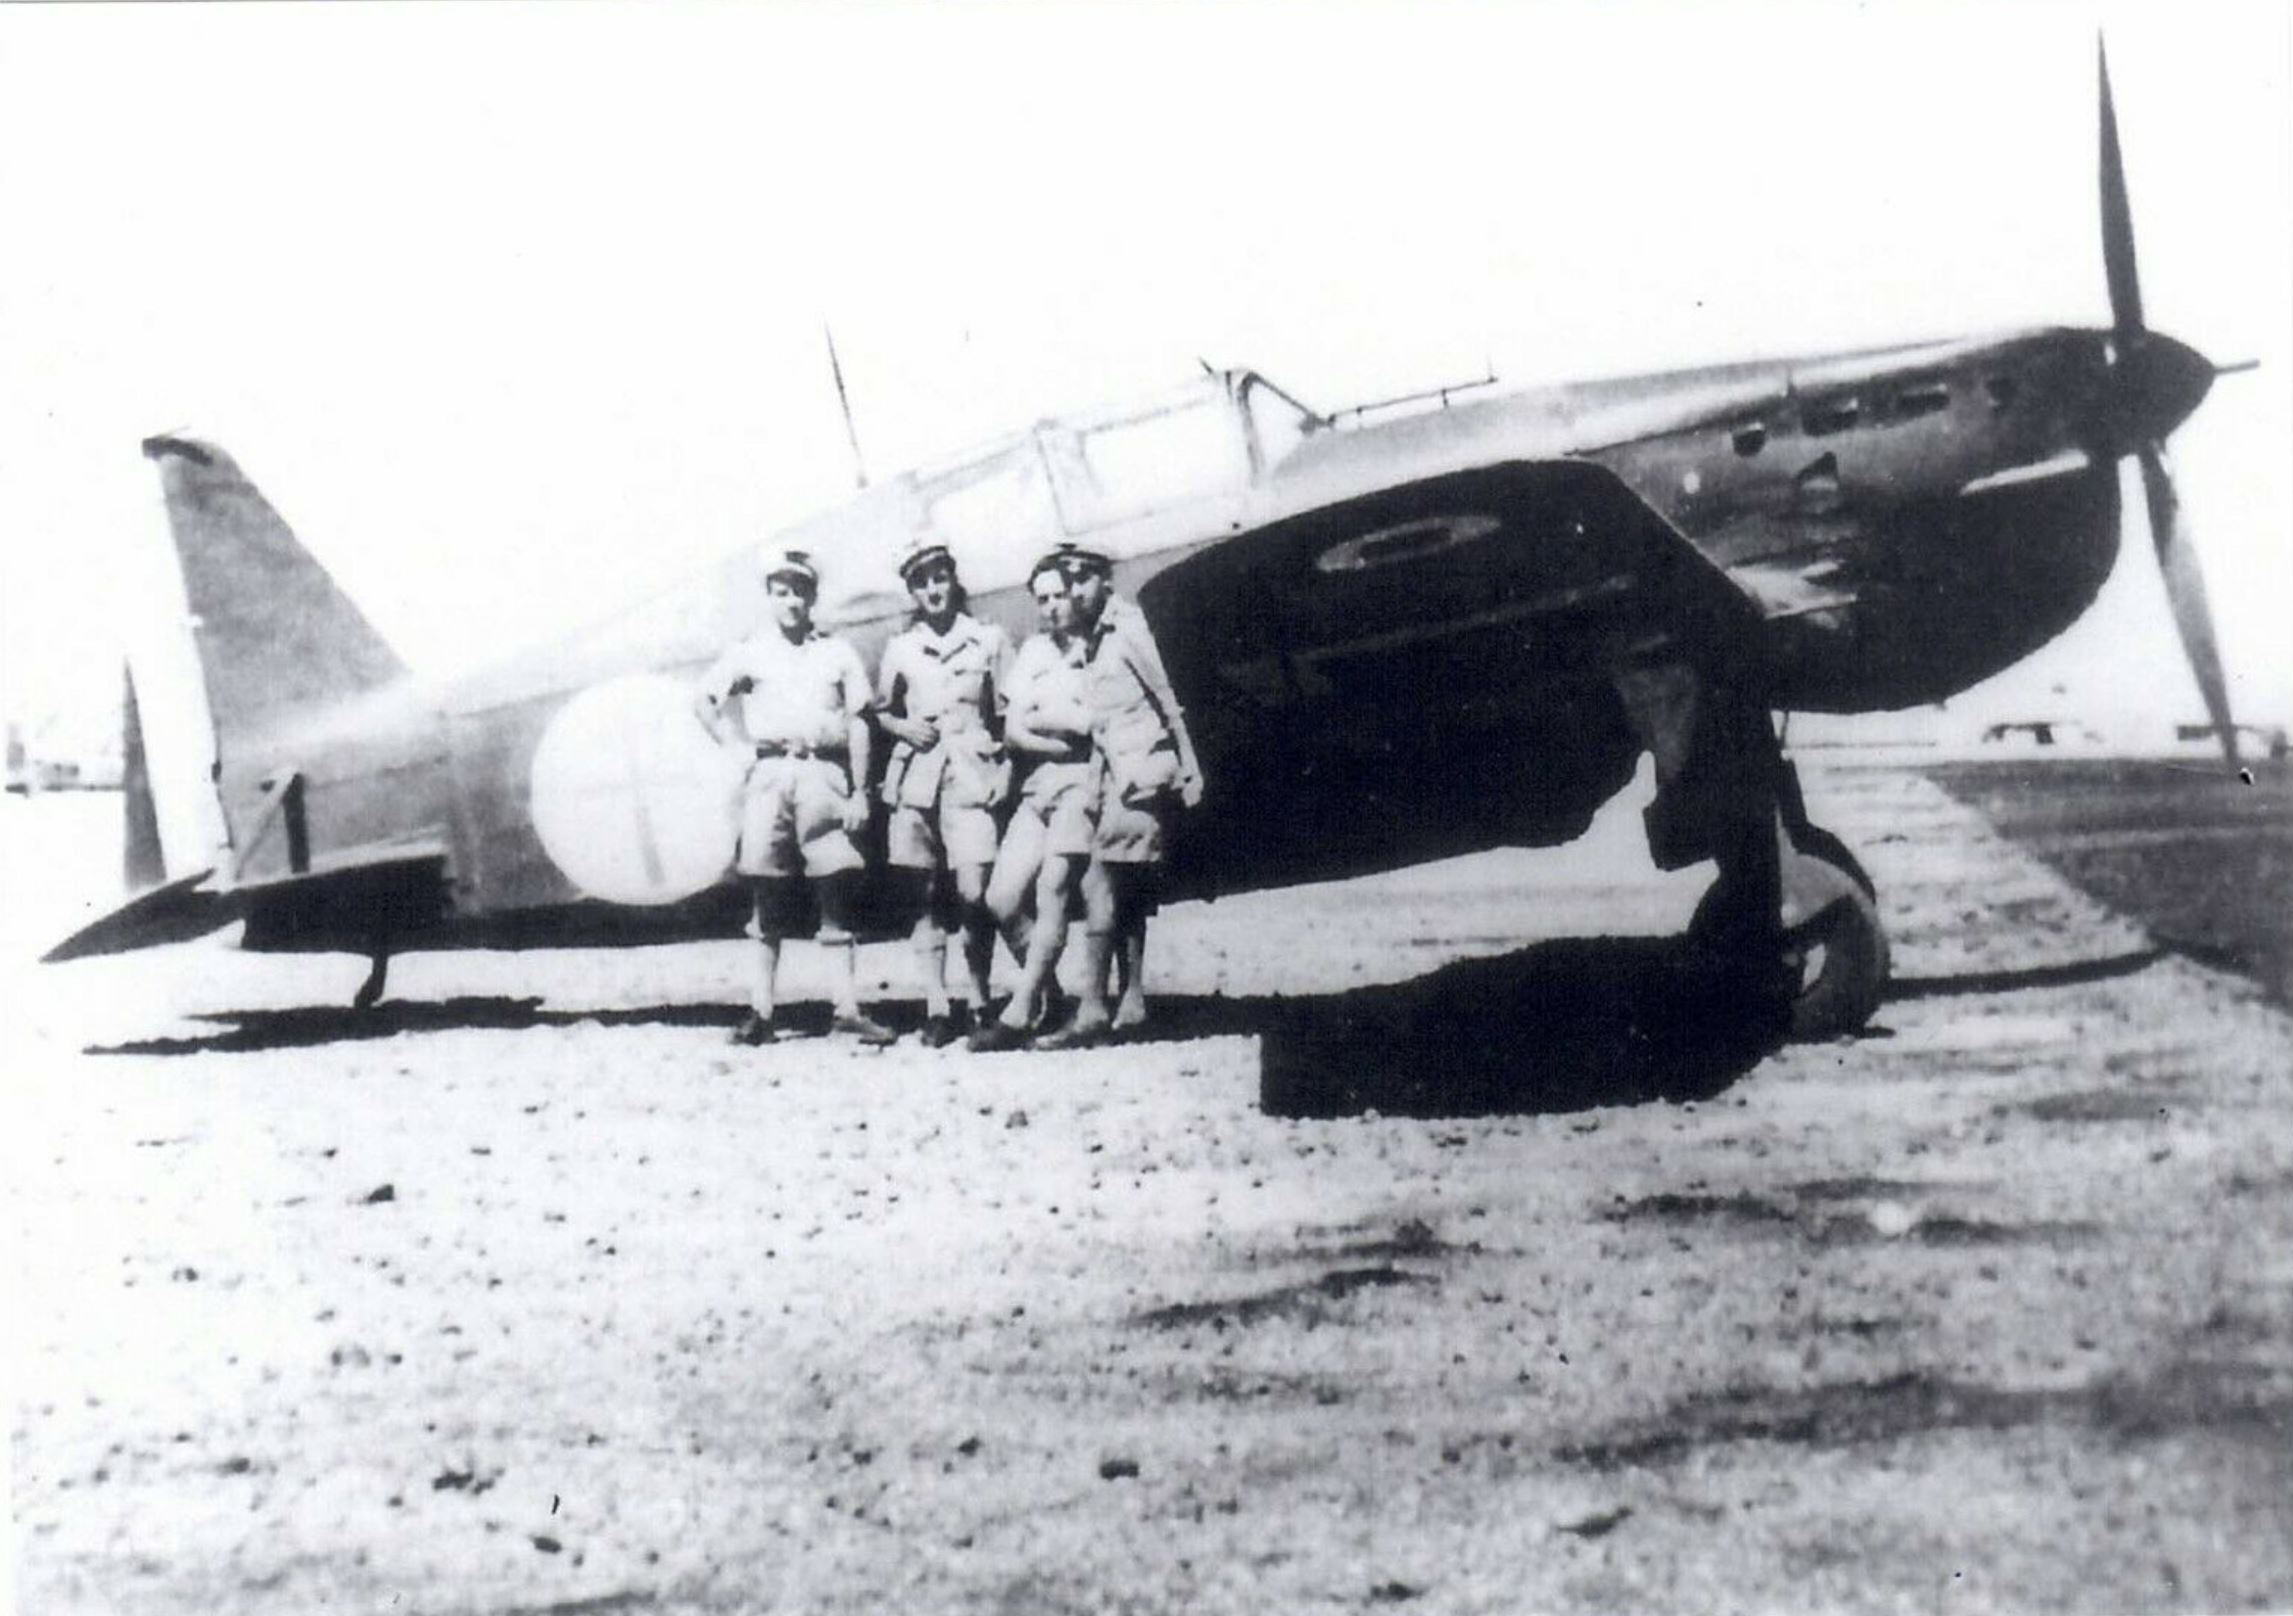 Free French Morane Saulnier MS 406C sn1019 mission ready North Africa 1942 43 ebay 01